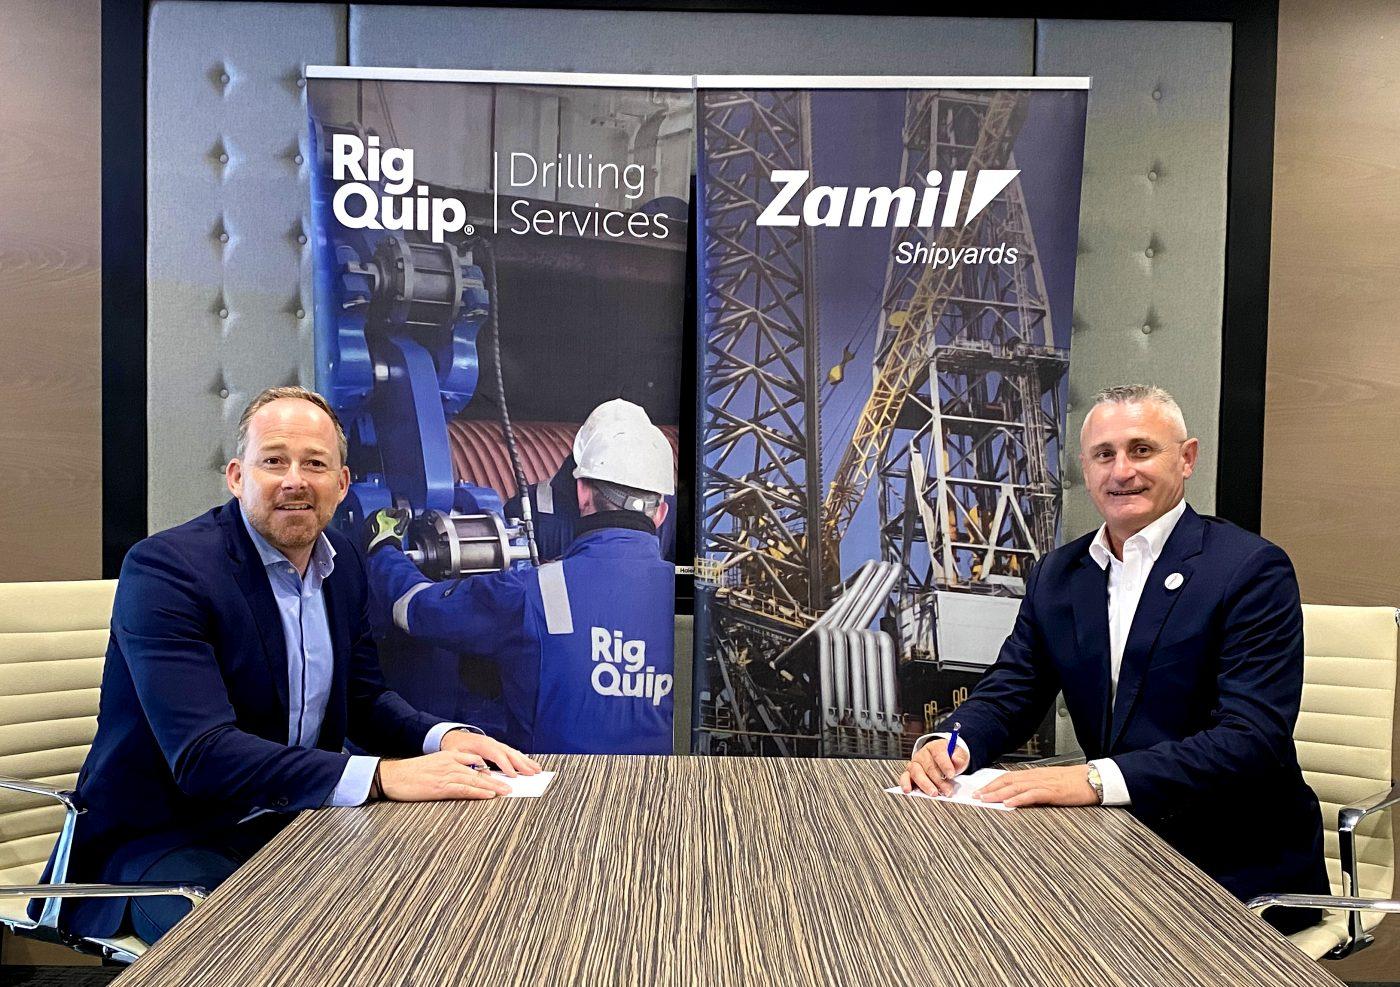 RigQuip and Zamil announce Saudi drilling equipment facility